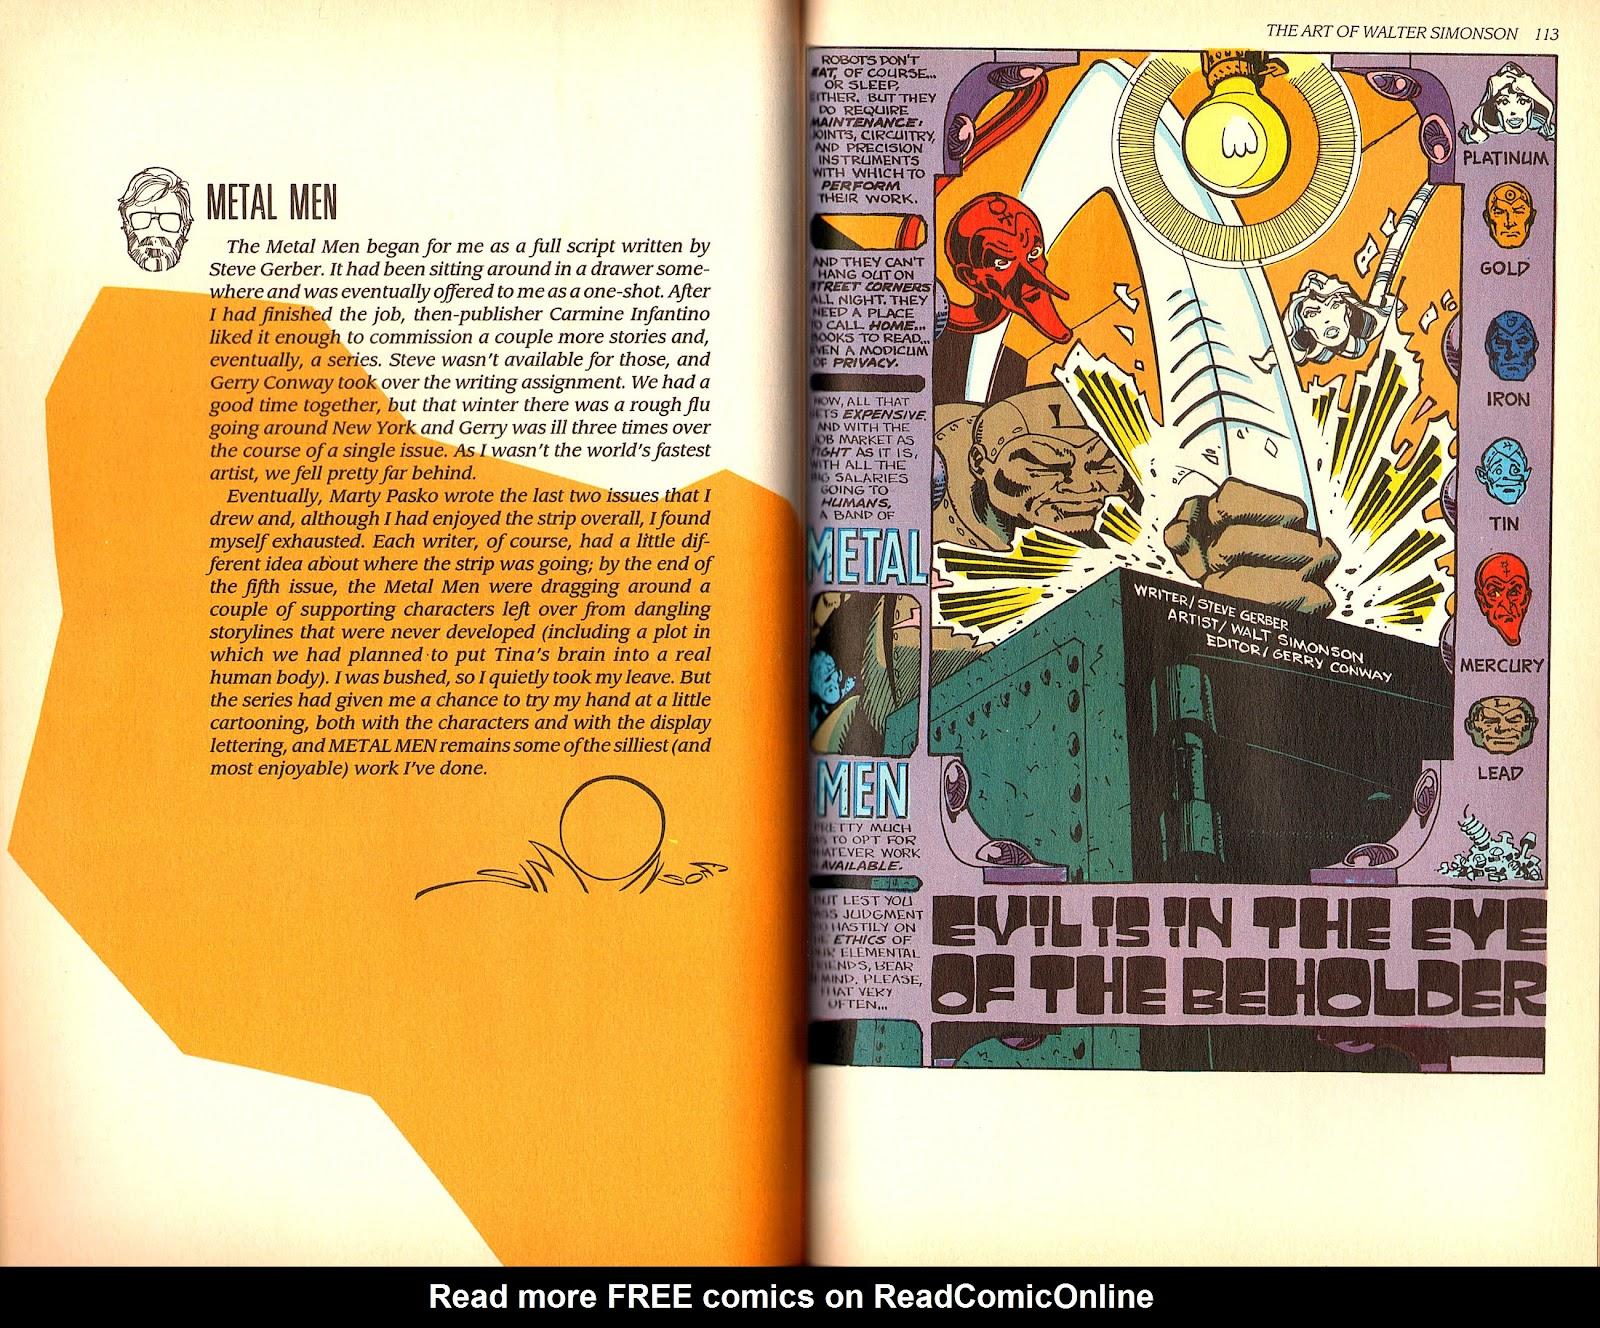 Read online The Art of Walter Simonson comic -  Issue # TPB - 58